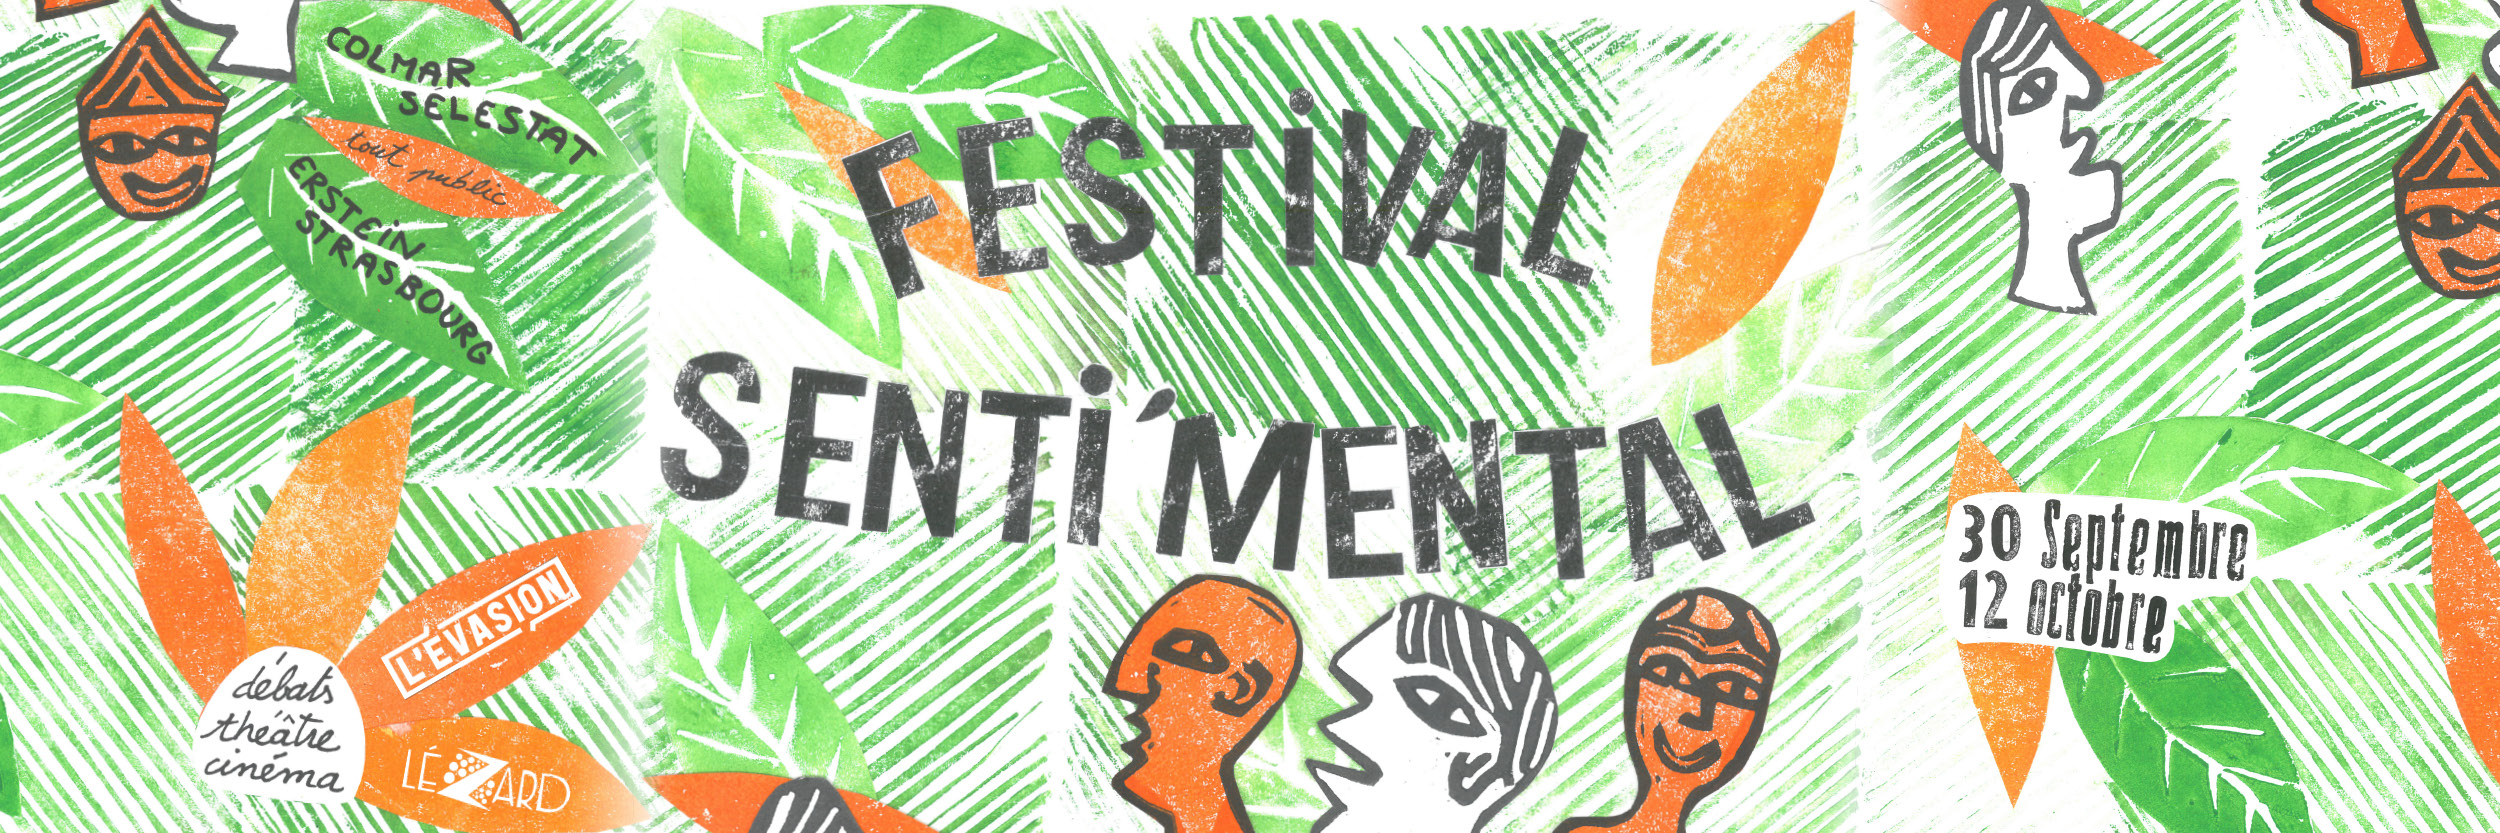 festival senti'mental